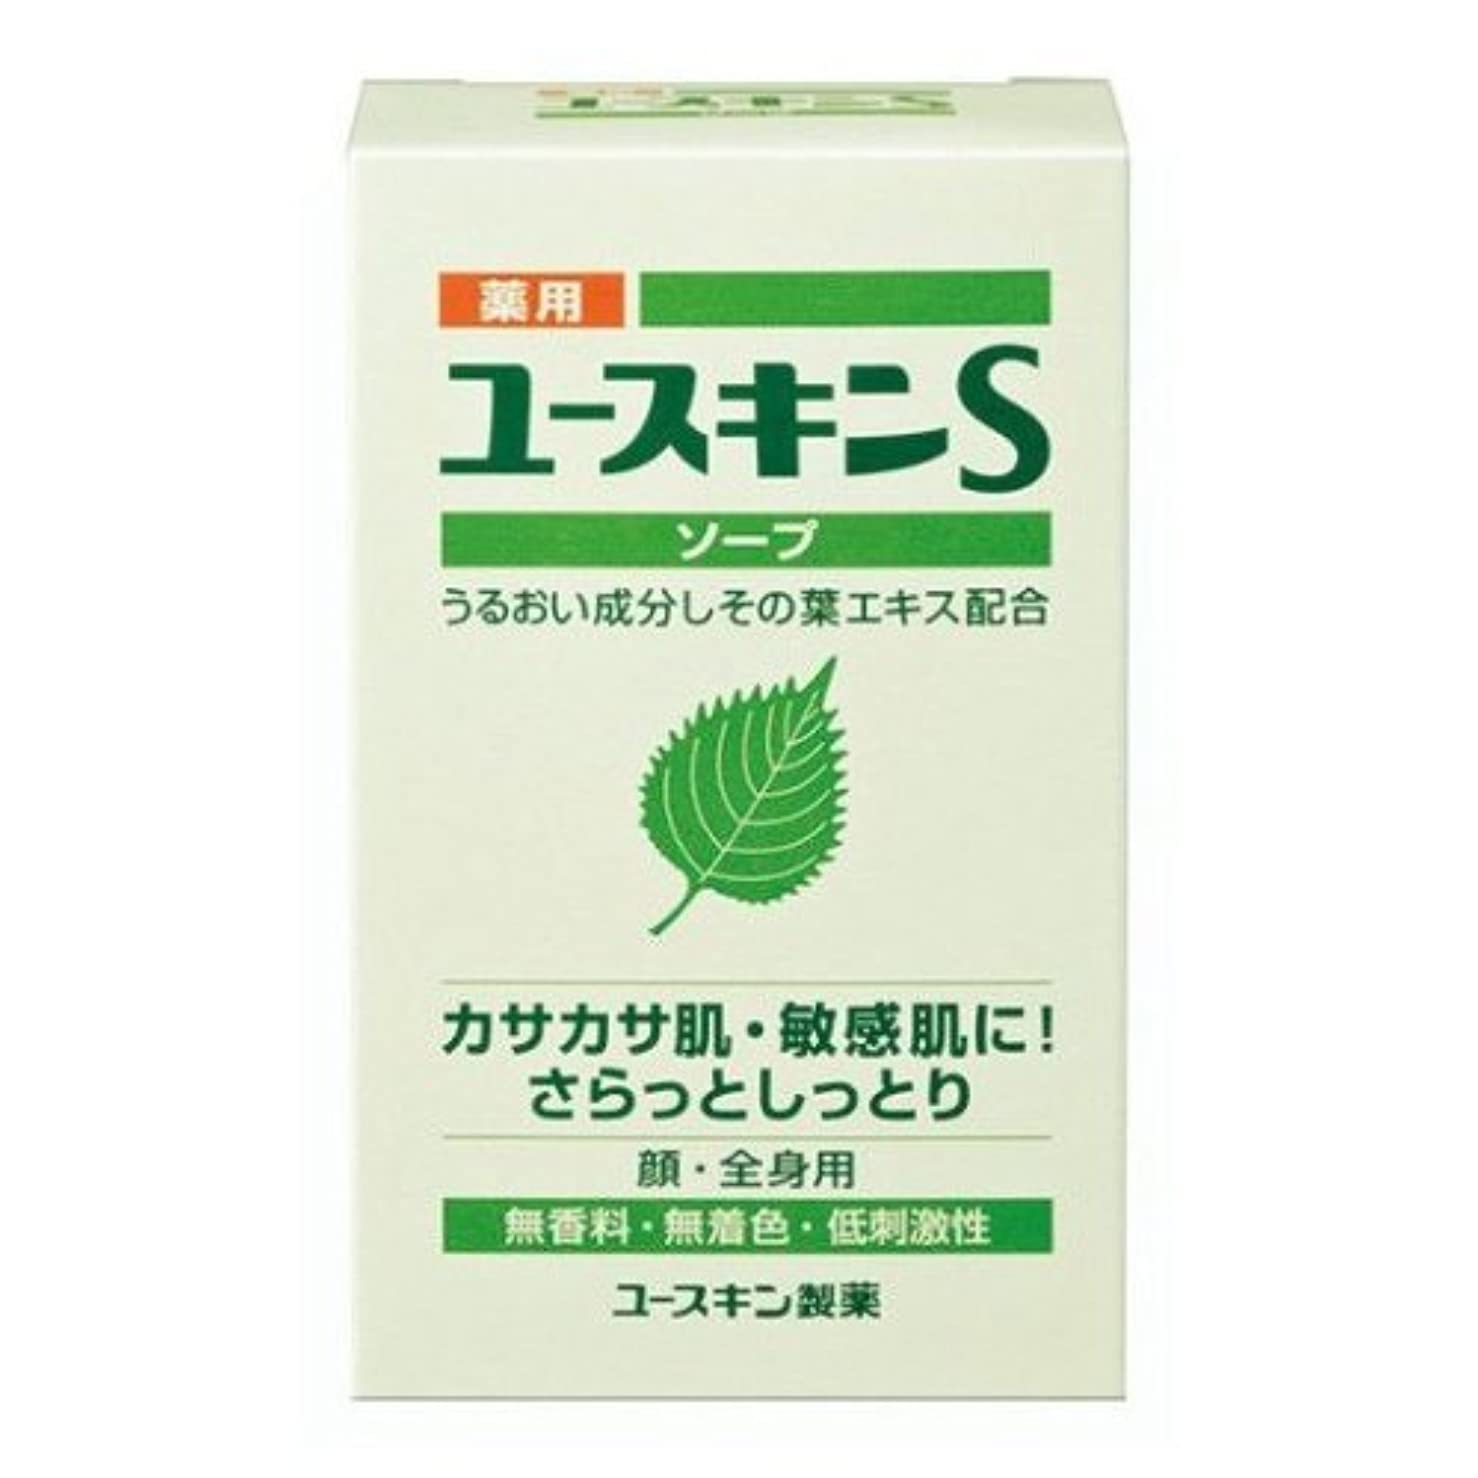 不確実公園拍手薬用ユースキンS ソープ 90g (敏感肌用 透明石鹸) 【医薬部外品】